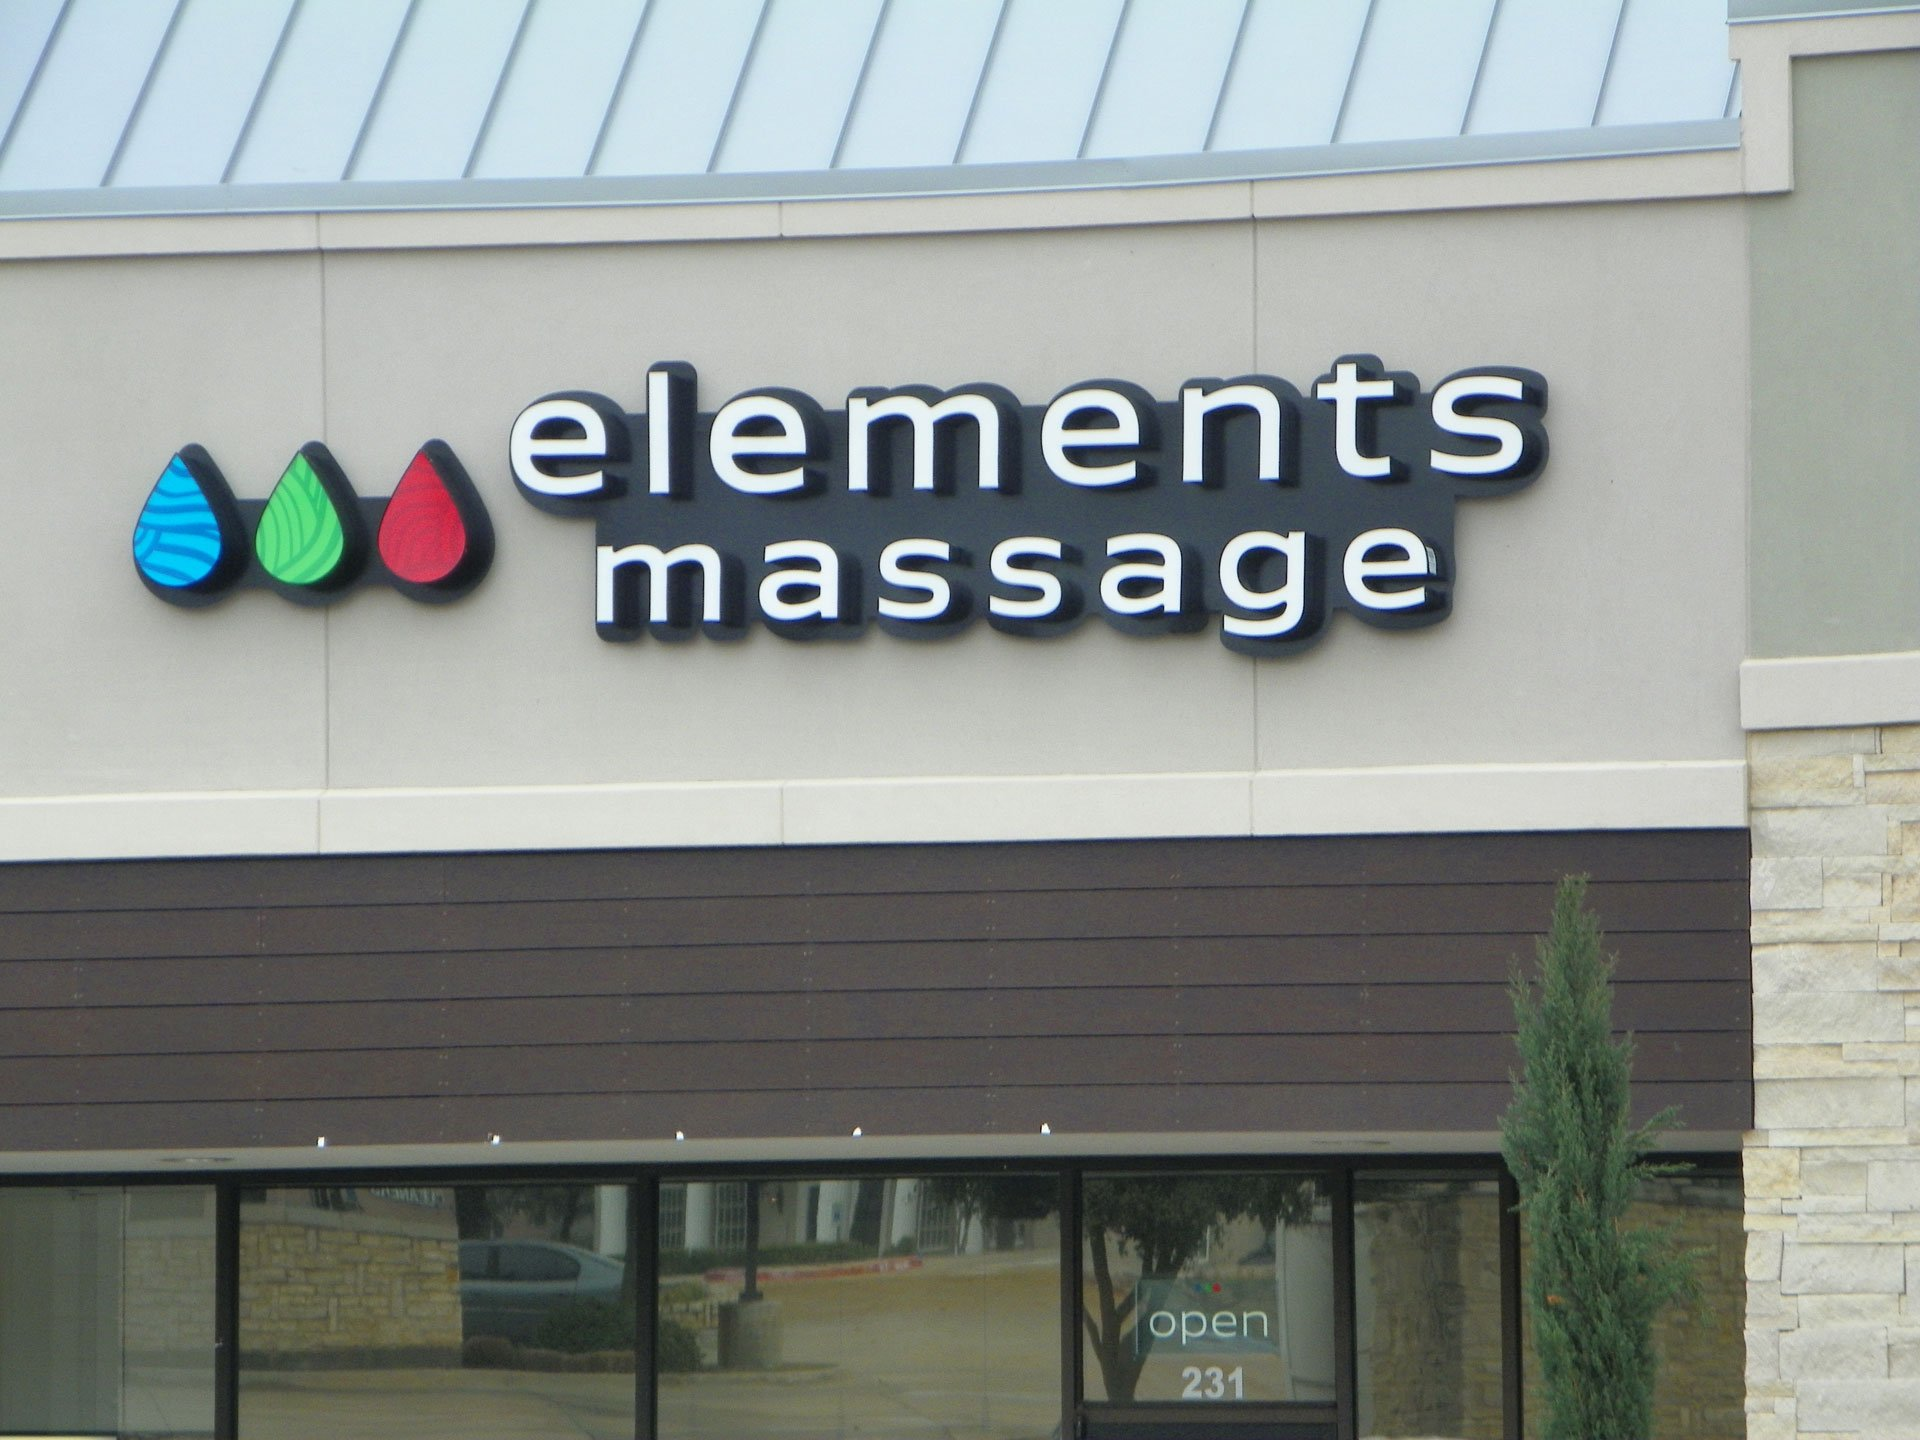 Elements Massage Sign